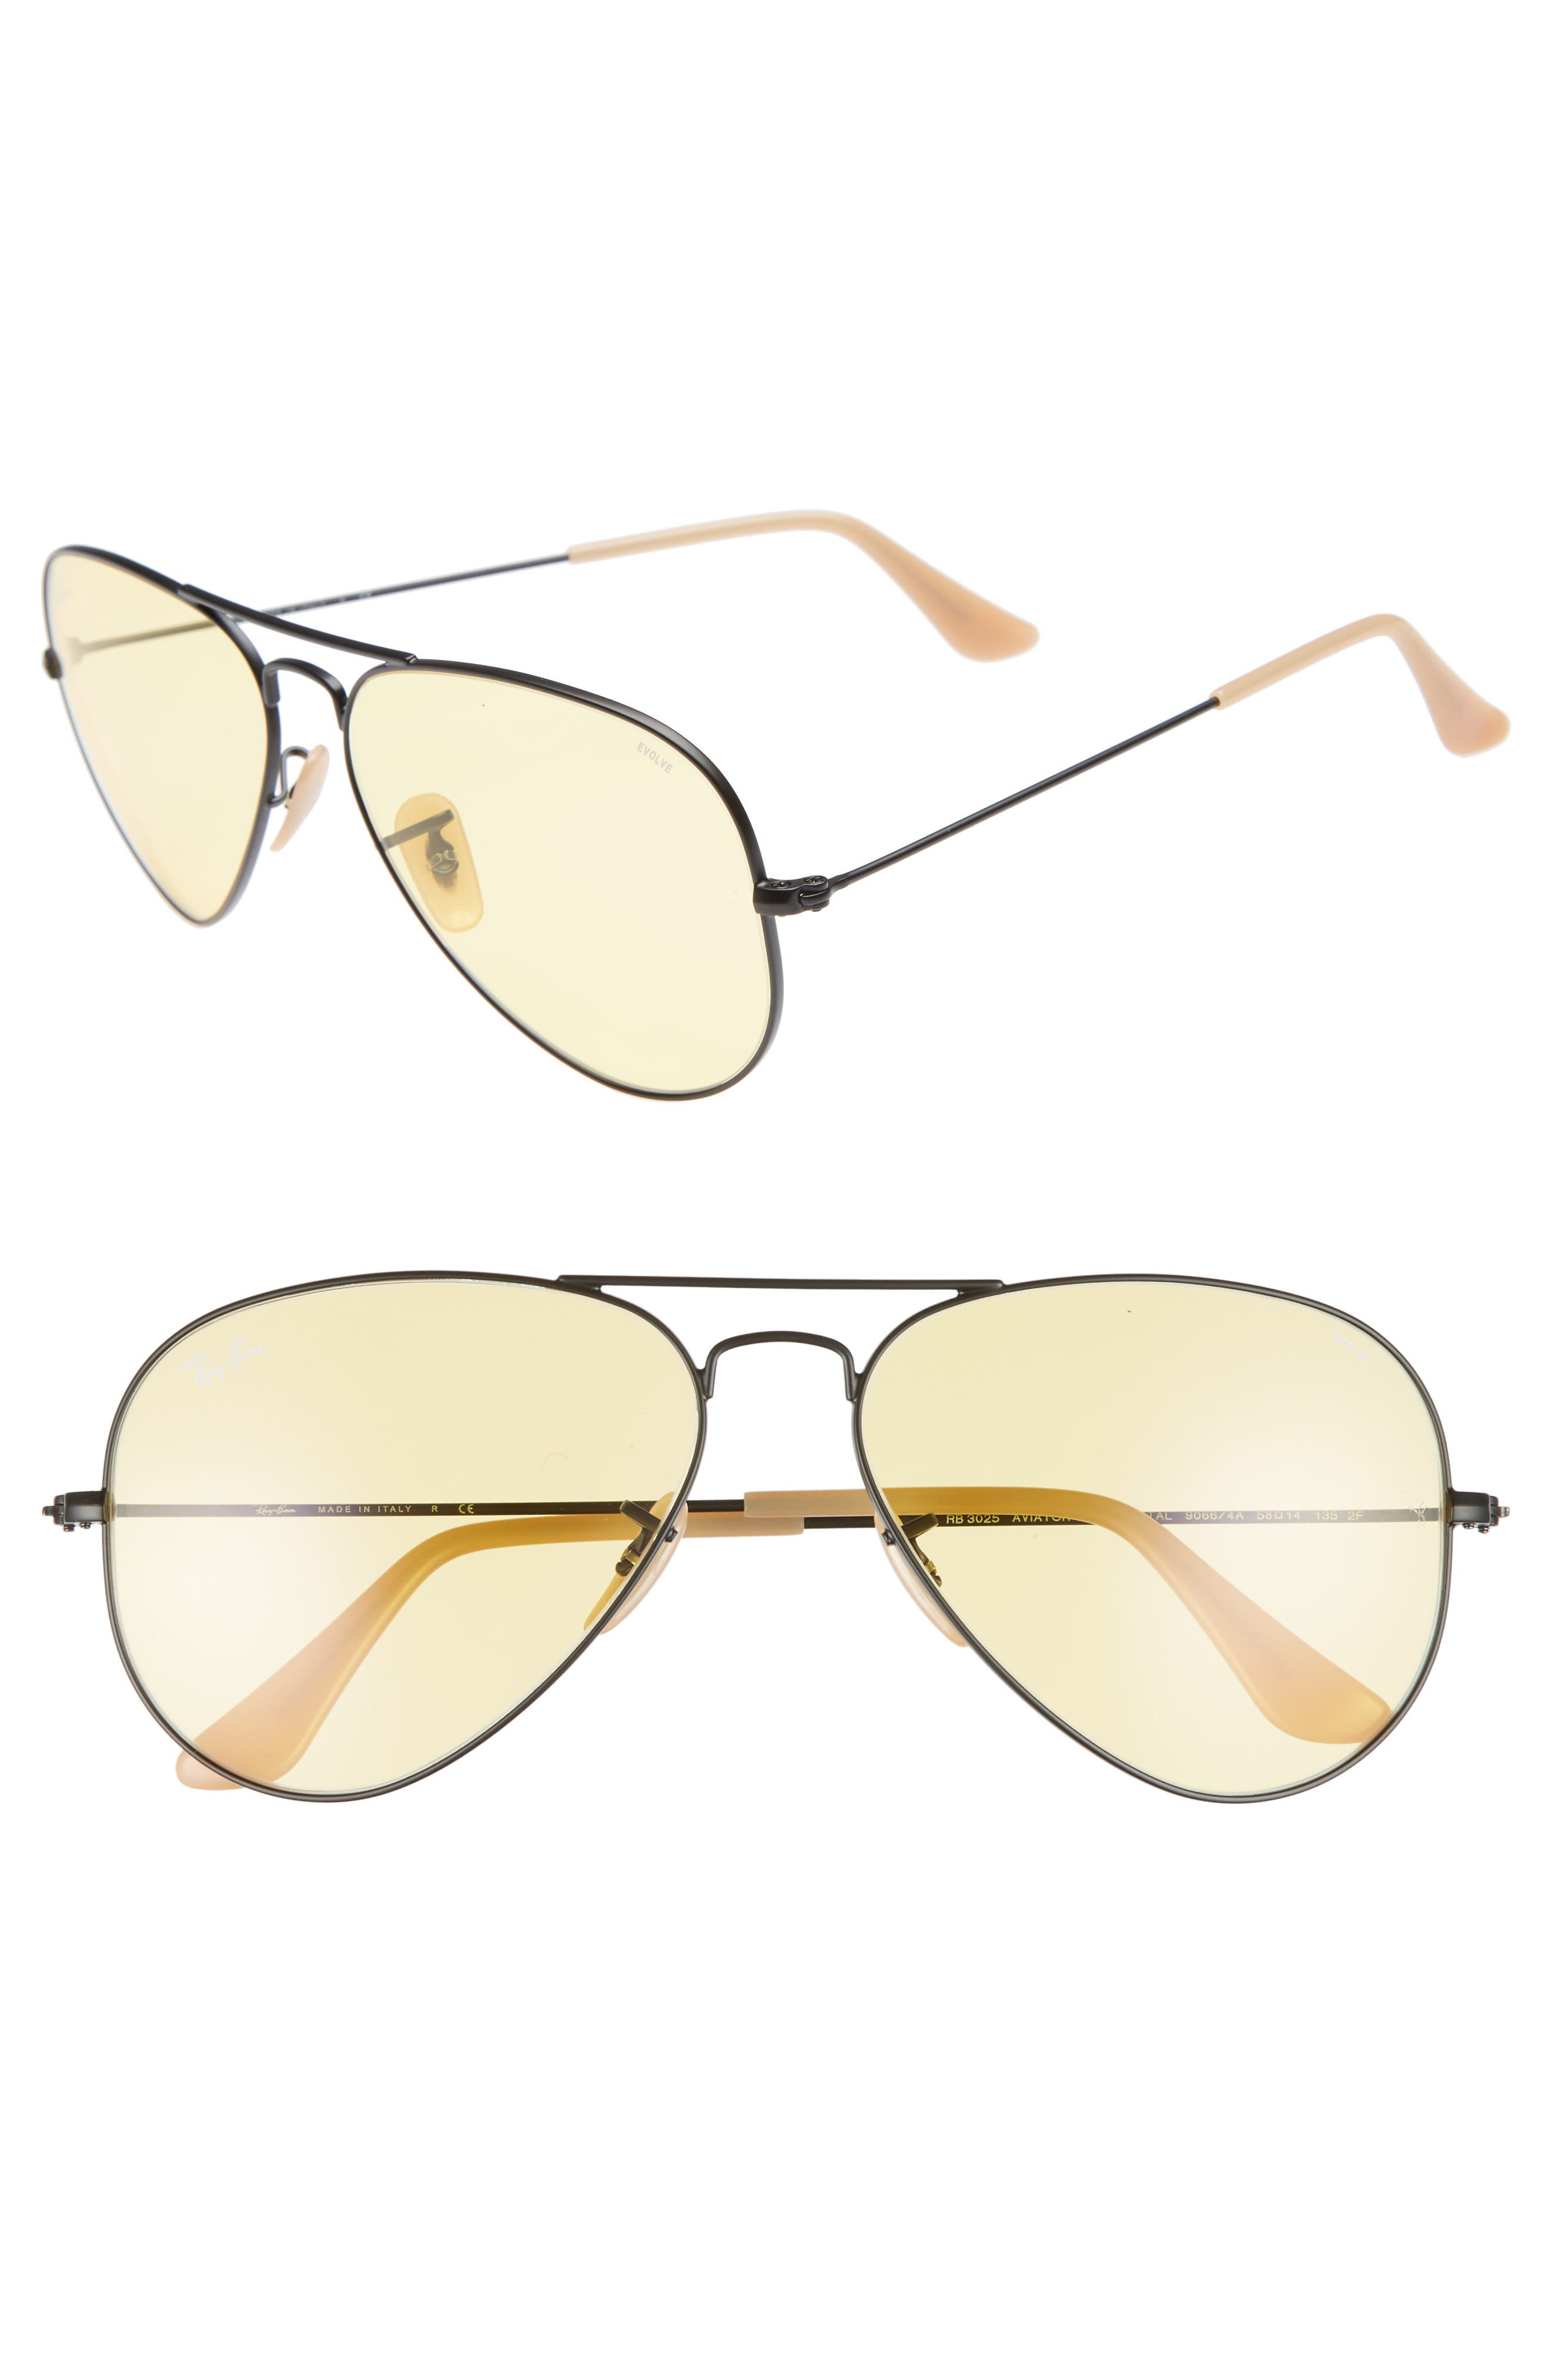 RAY-BAN Evolve 58mm Polarized Aviator Sunglasses, Main, color, 016